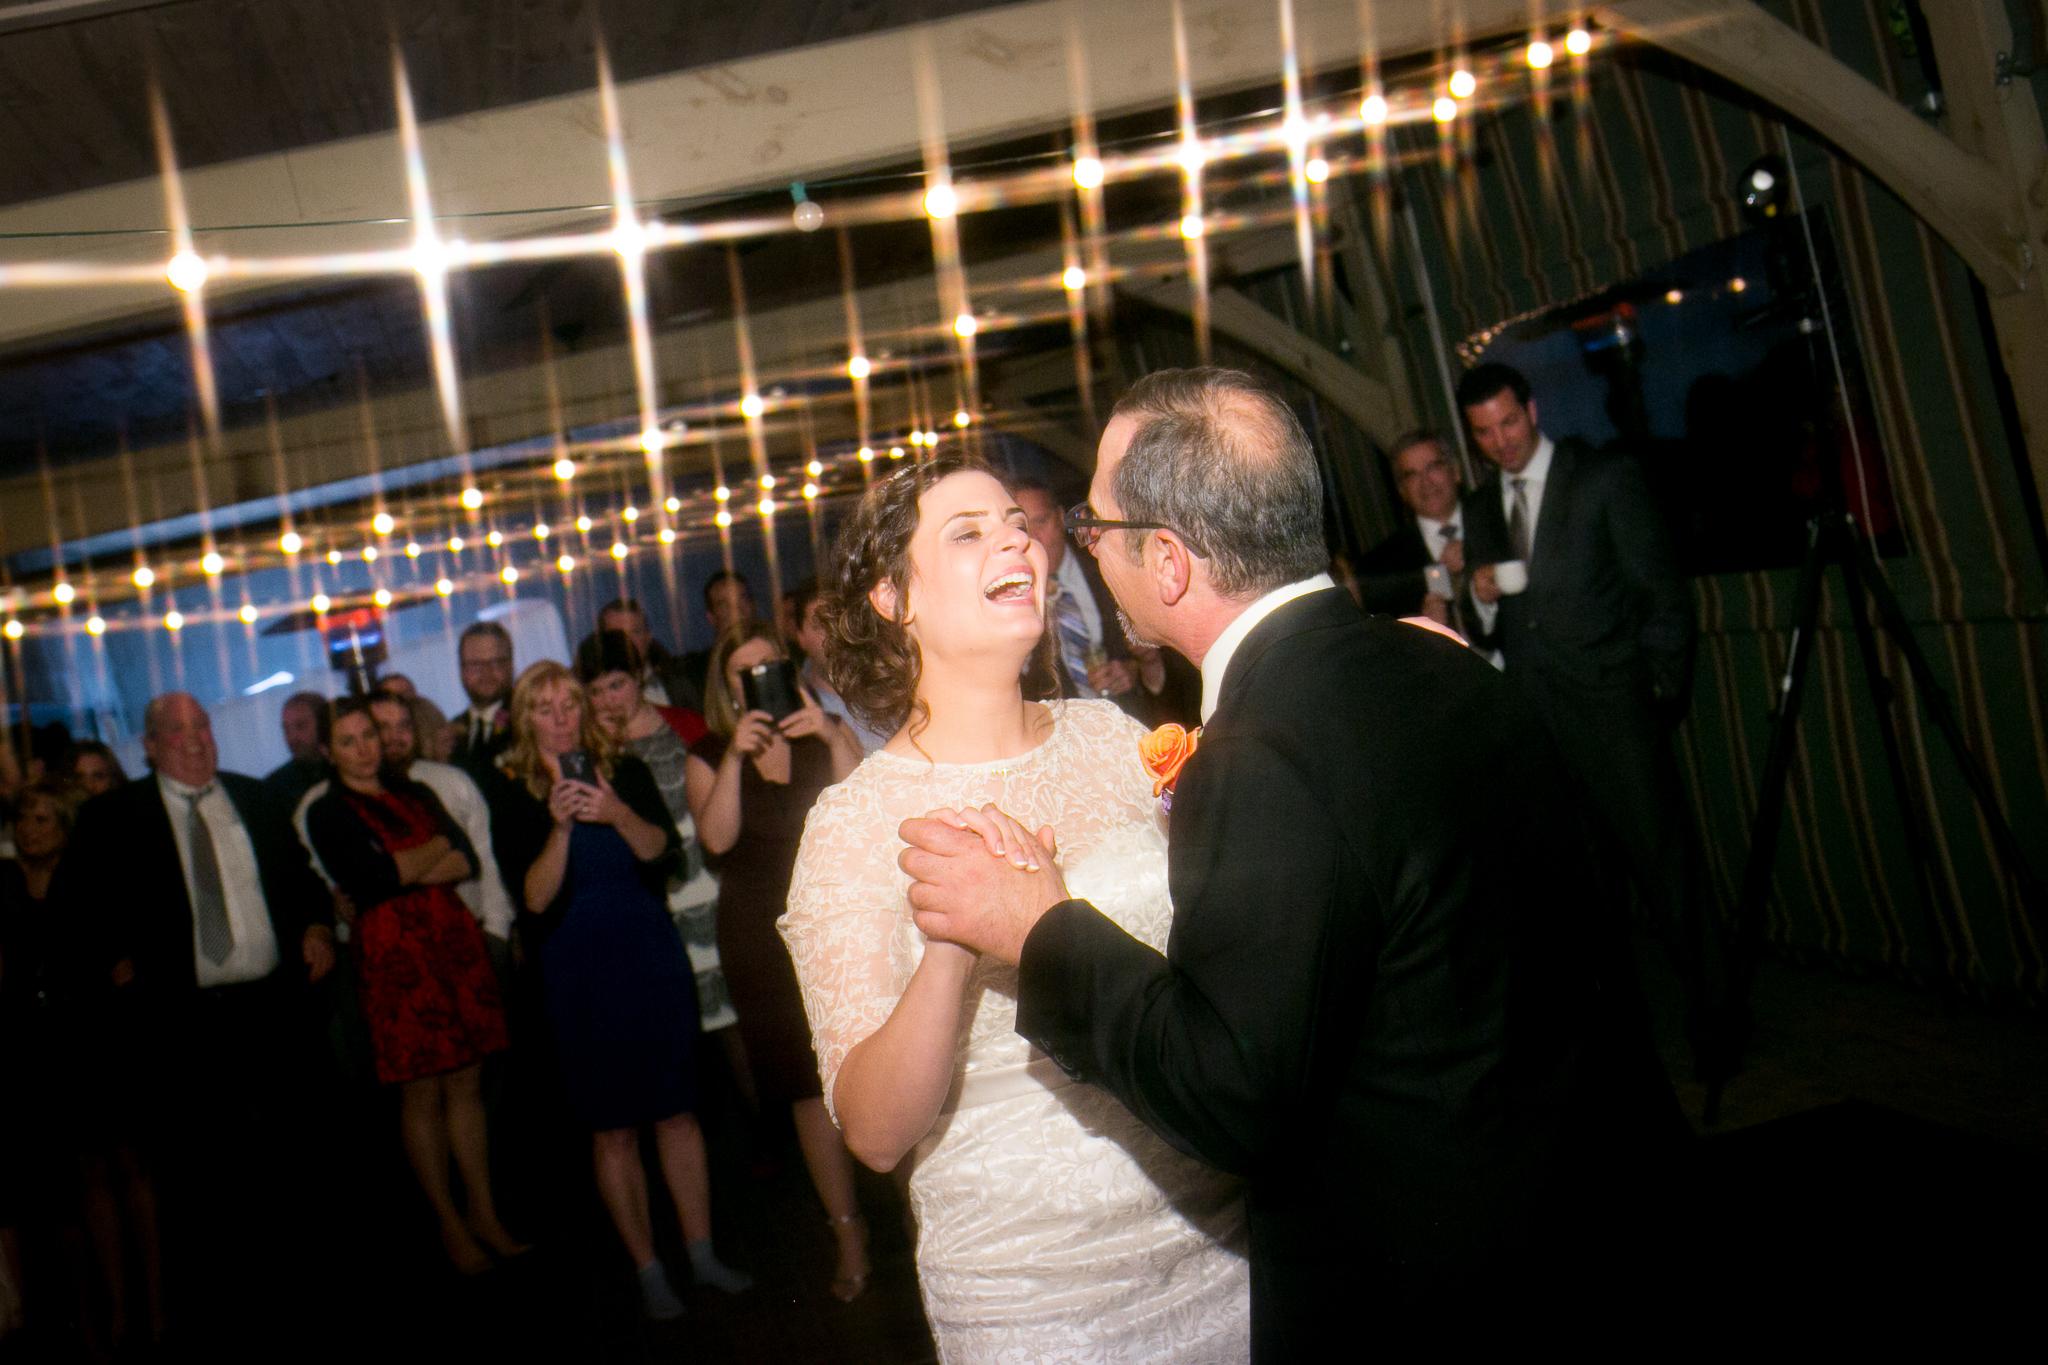 camuglia-whomstudio-chelsea_and_andy-nycphotographer-wedding-brooklyn-buffalo-timberlodge-123-5620.jpg